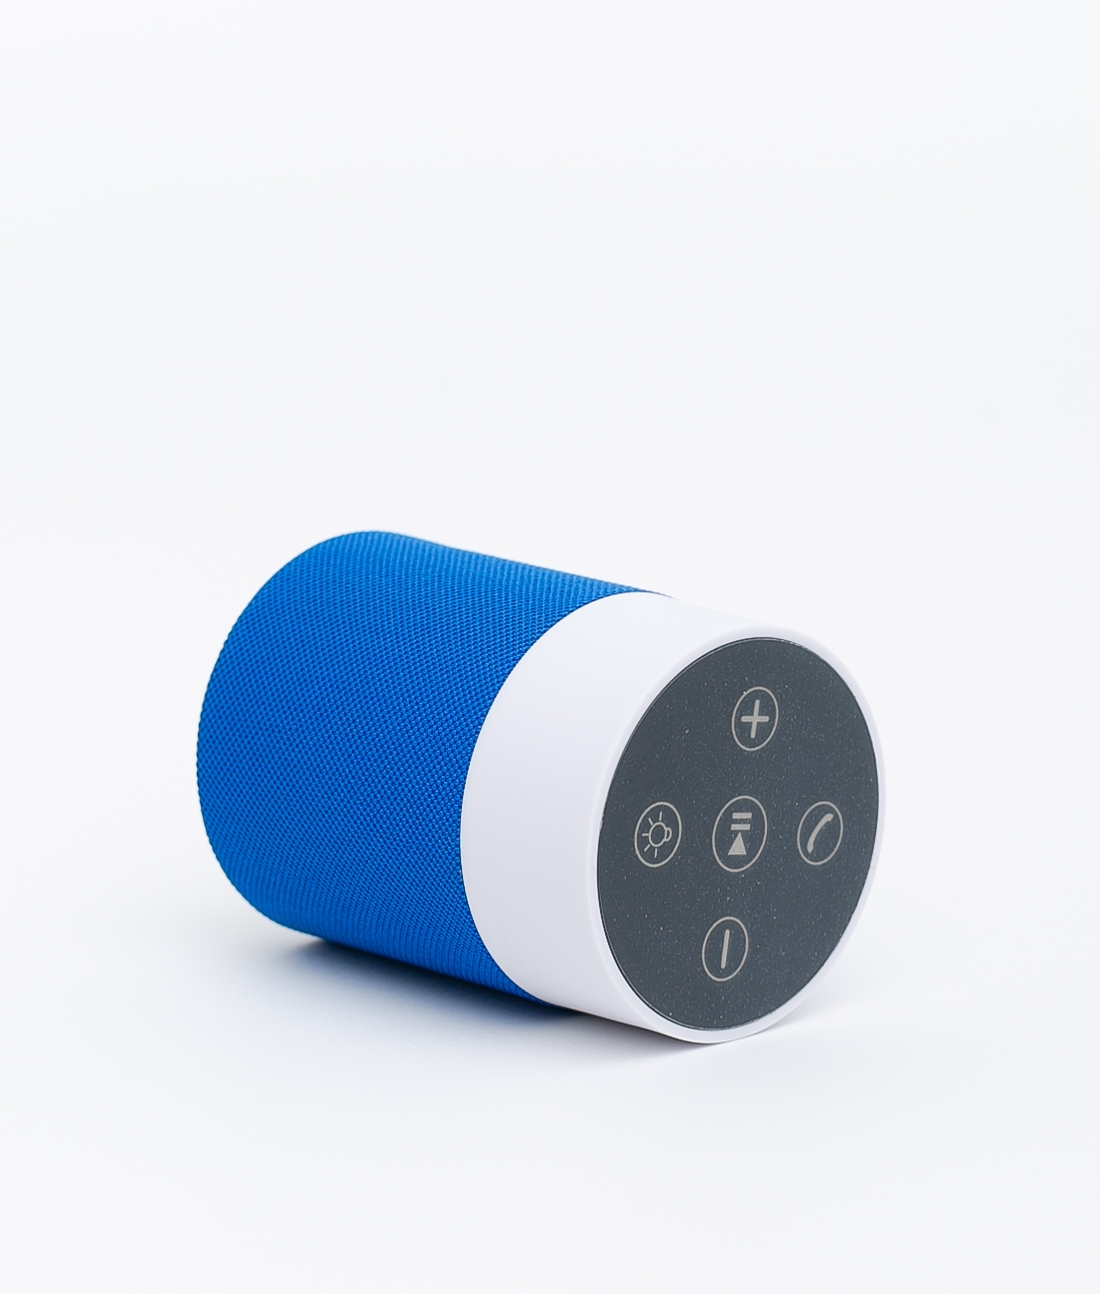 Haut-parleur Bluetooth Abacus - Bleu